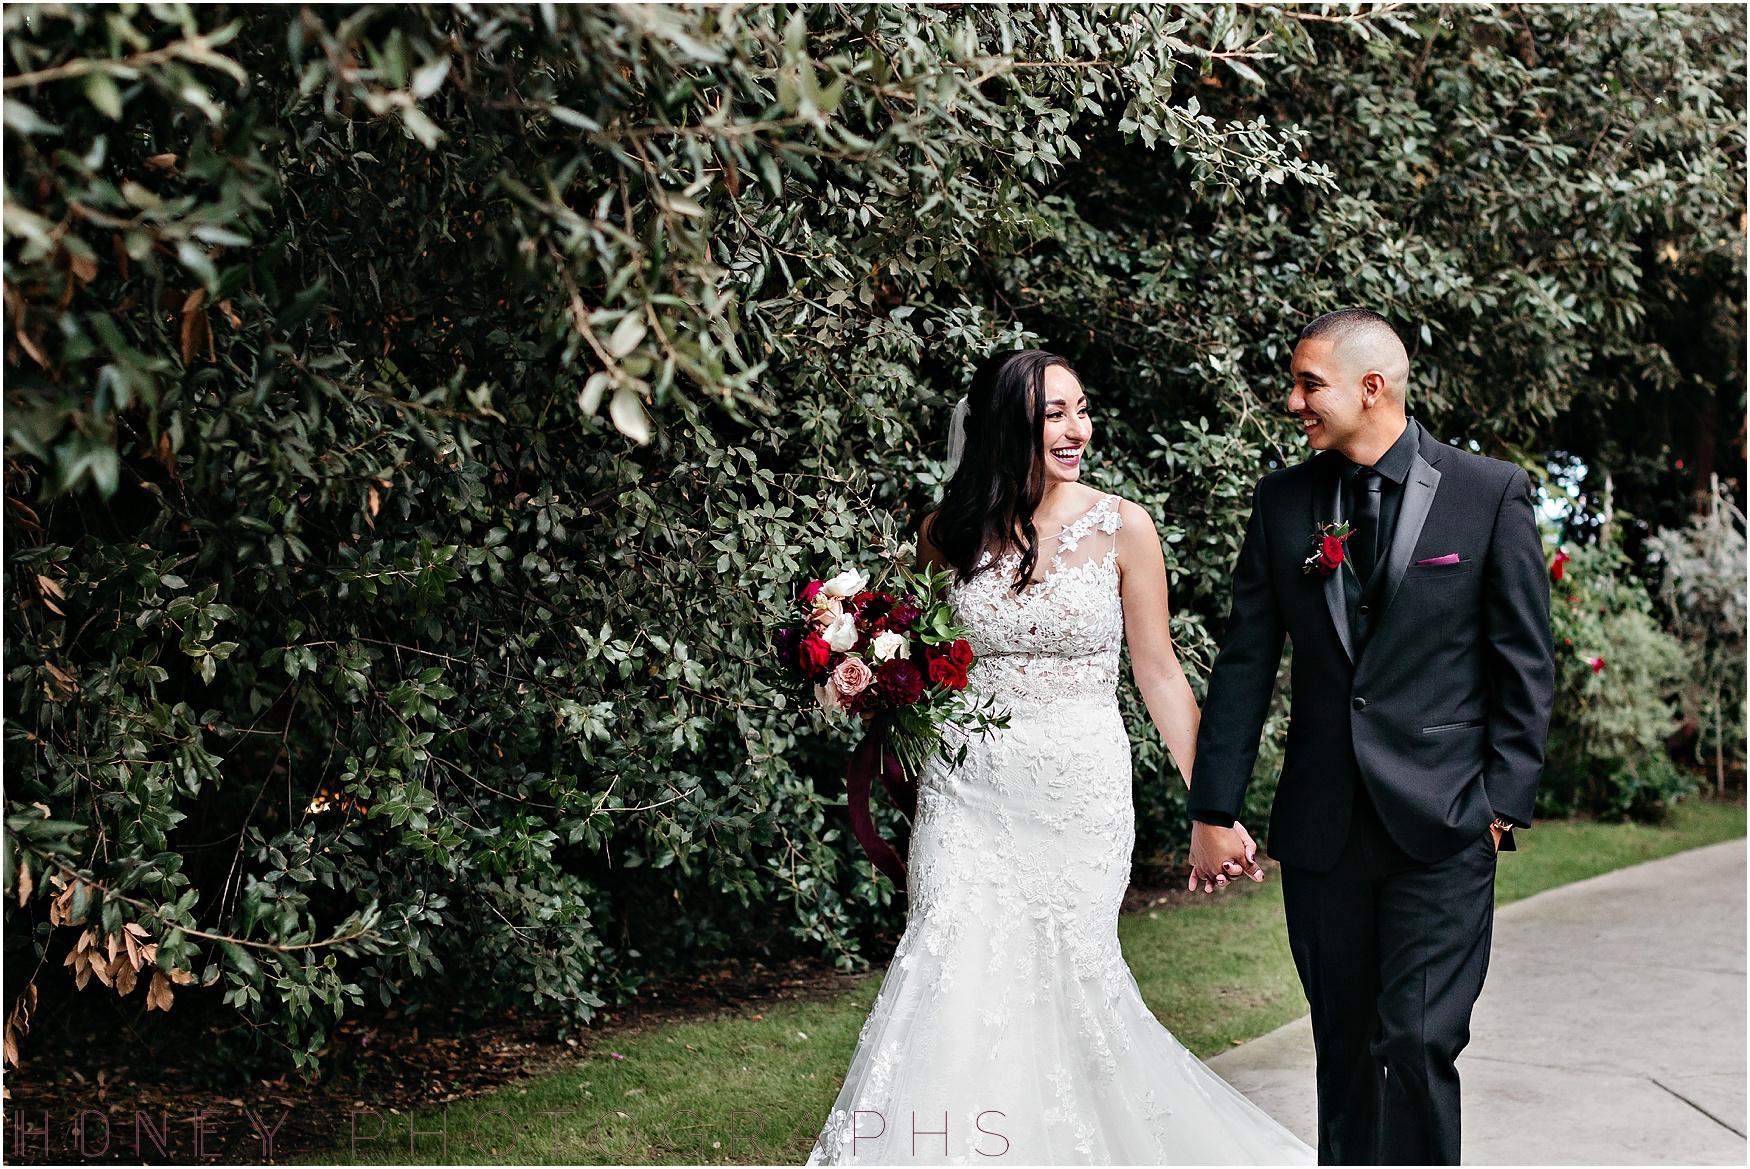 twin_oaks_garden_estate_fall_winter_burgundy_wedding036.jpg